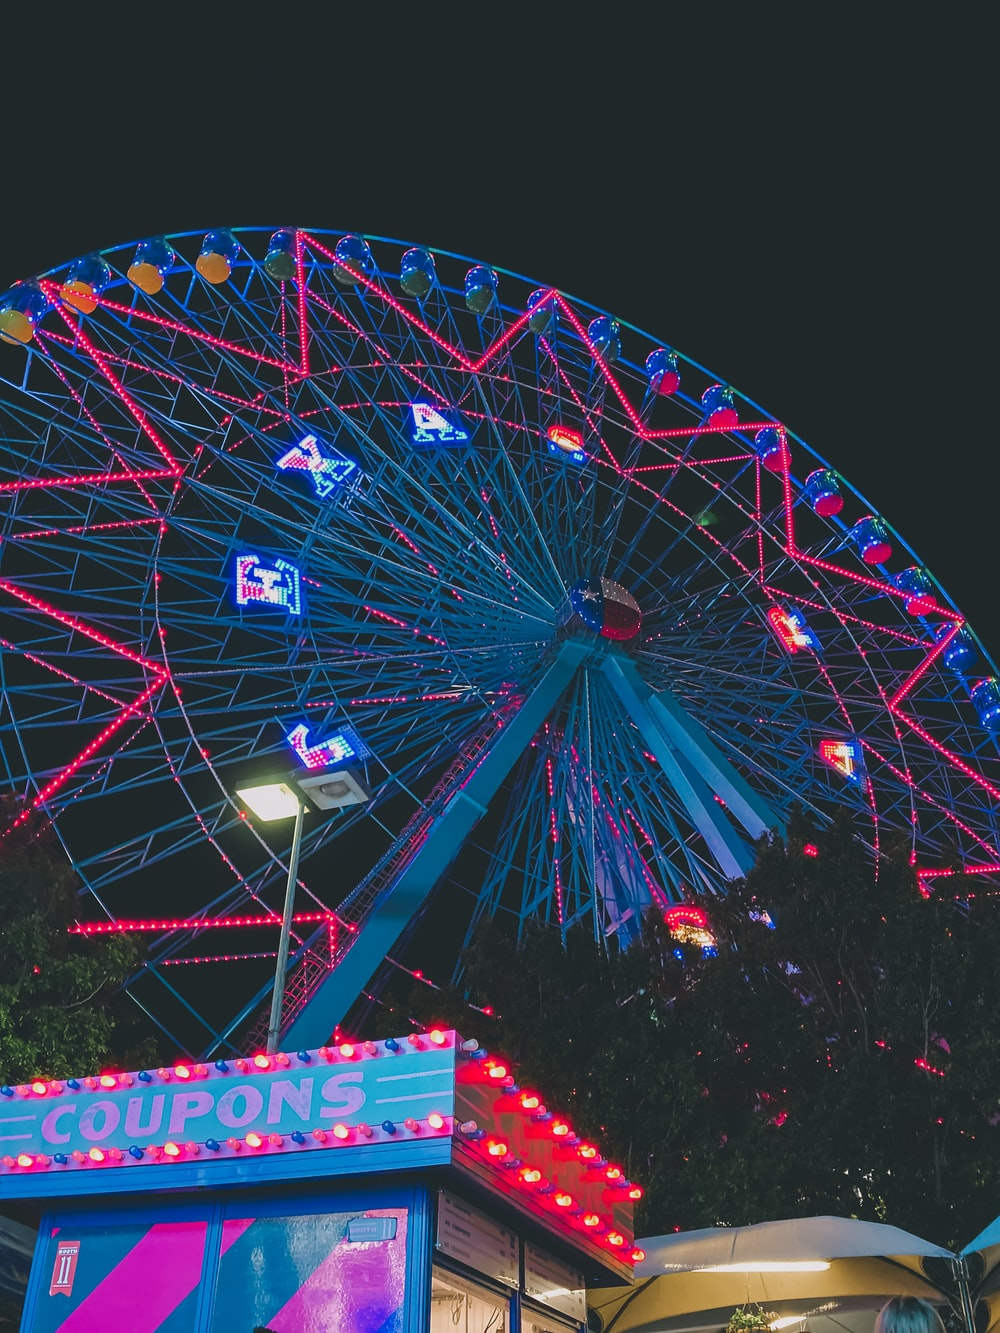 Ferris wheel during night